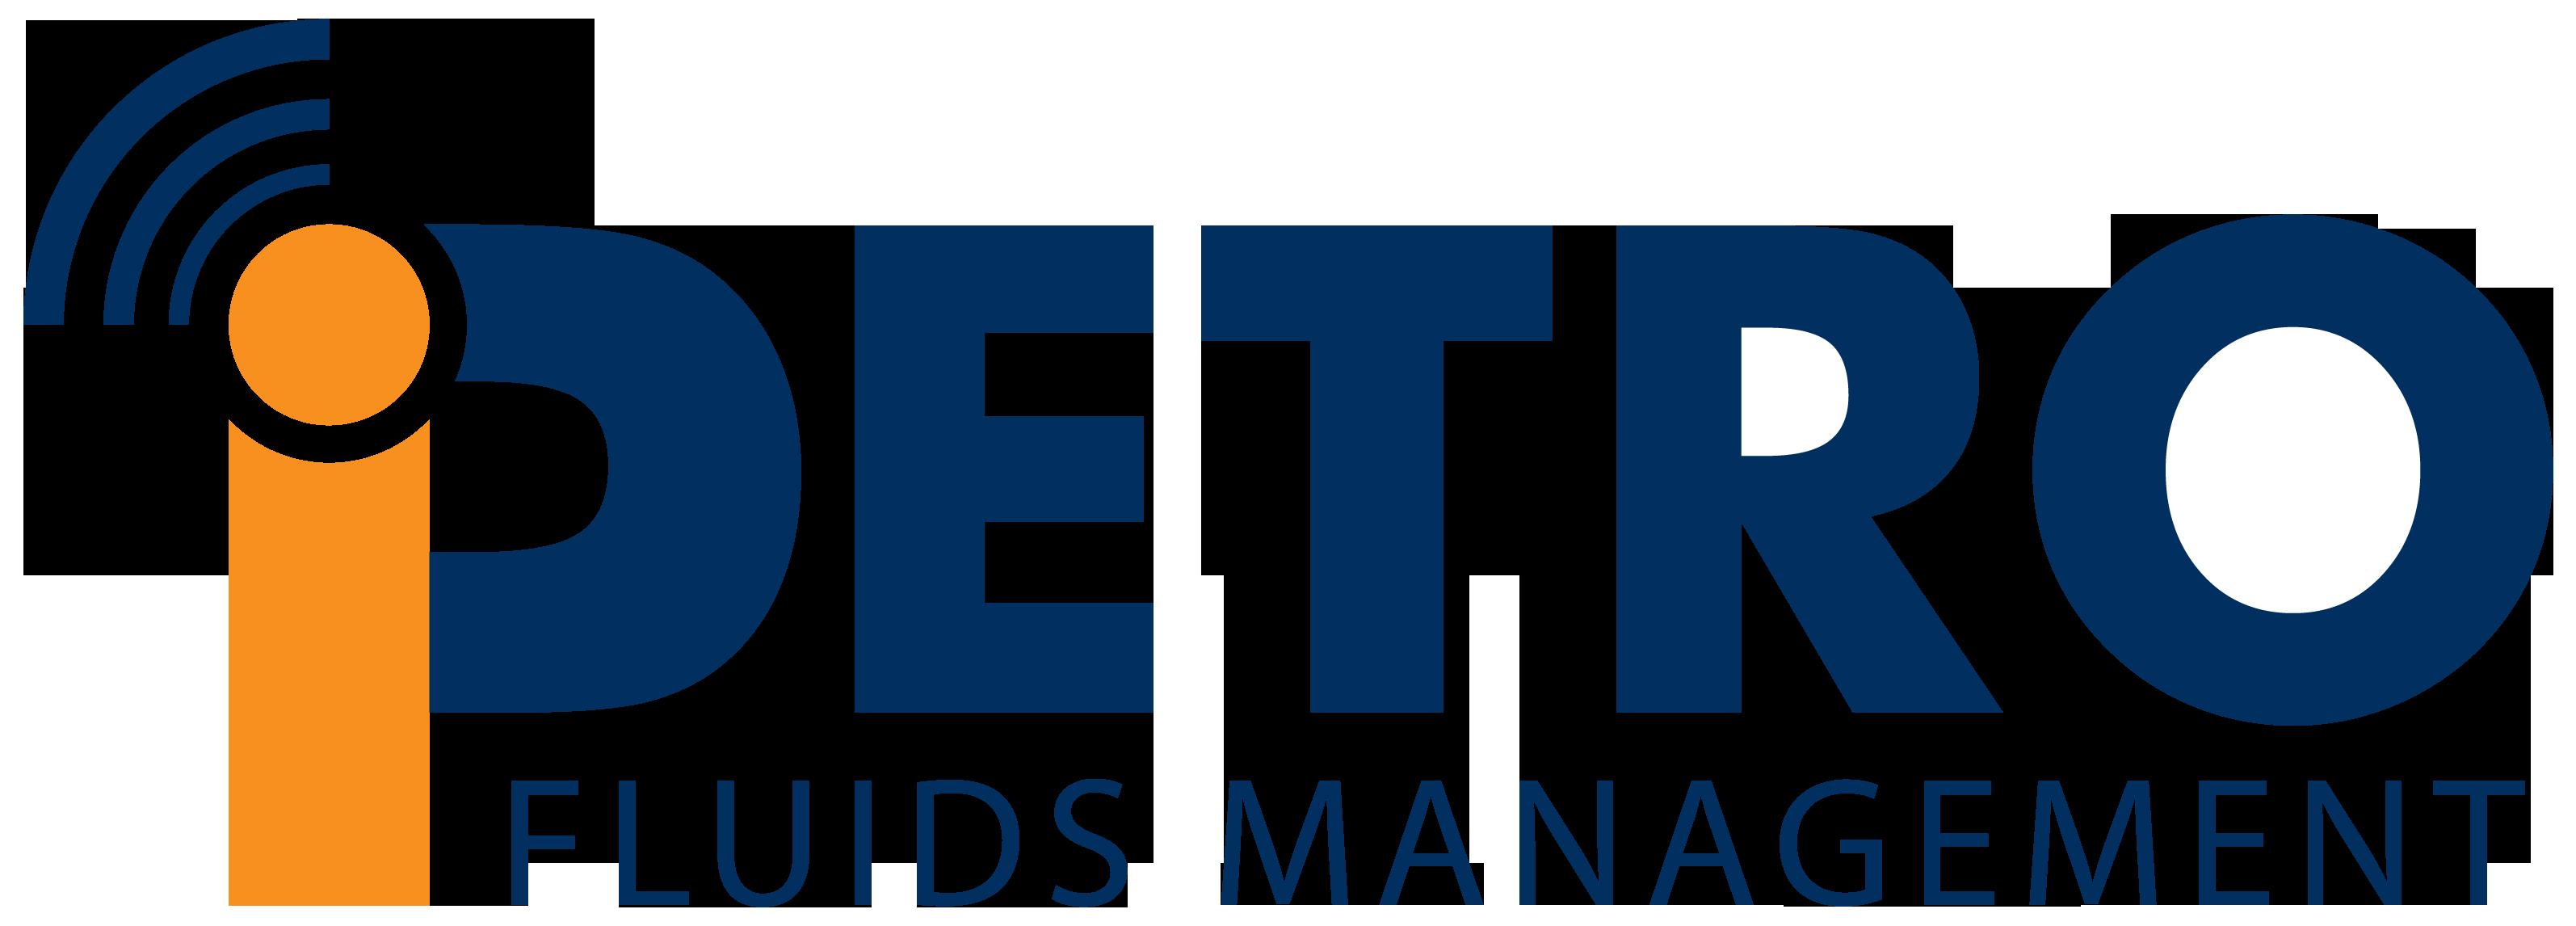 iPETRO Fluids Management